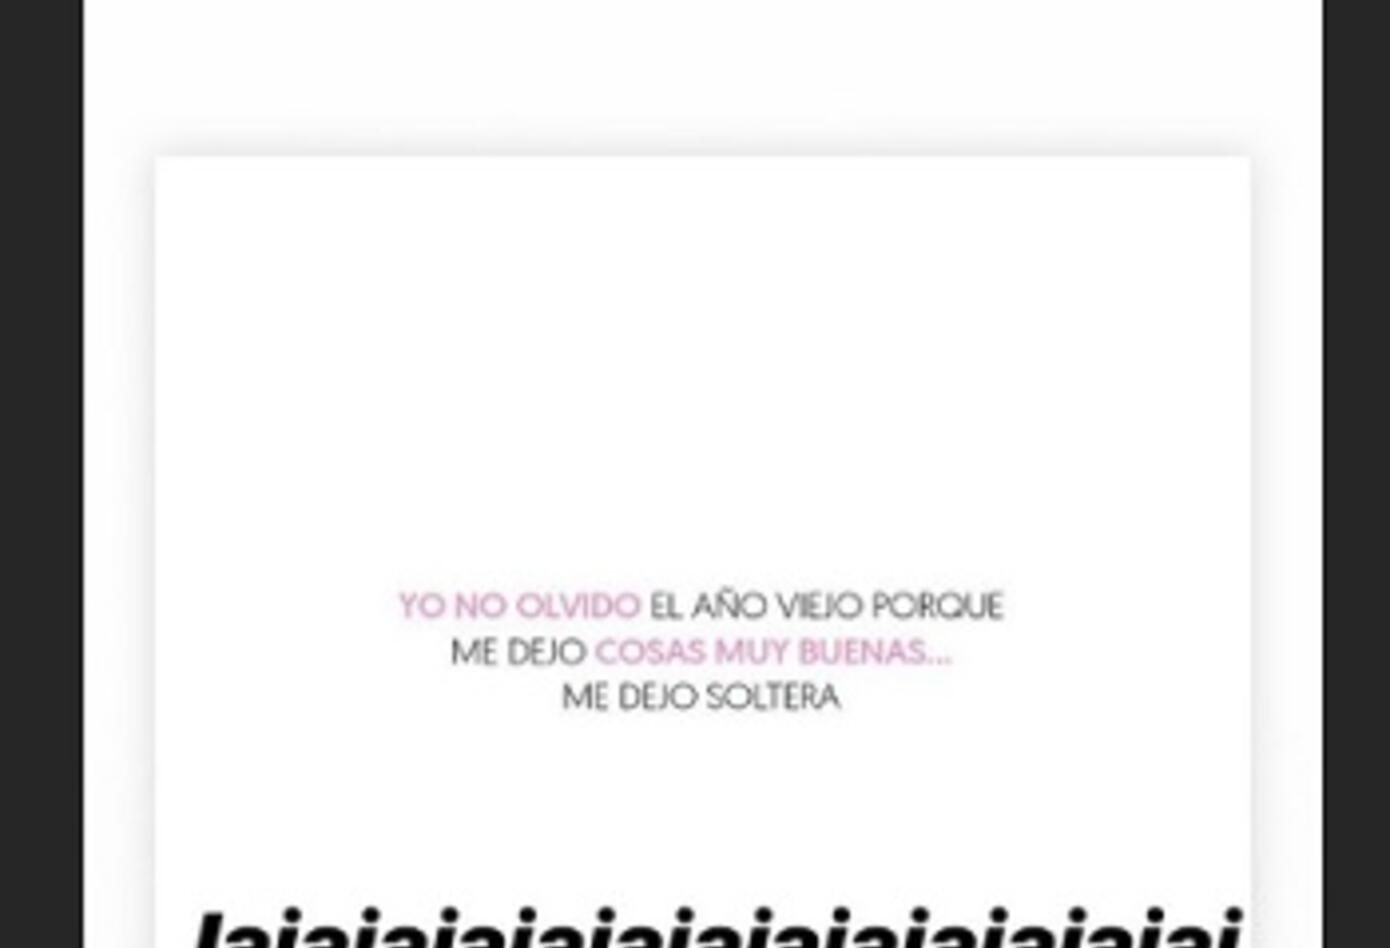 Lina Tejeiro Instagram